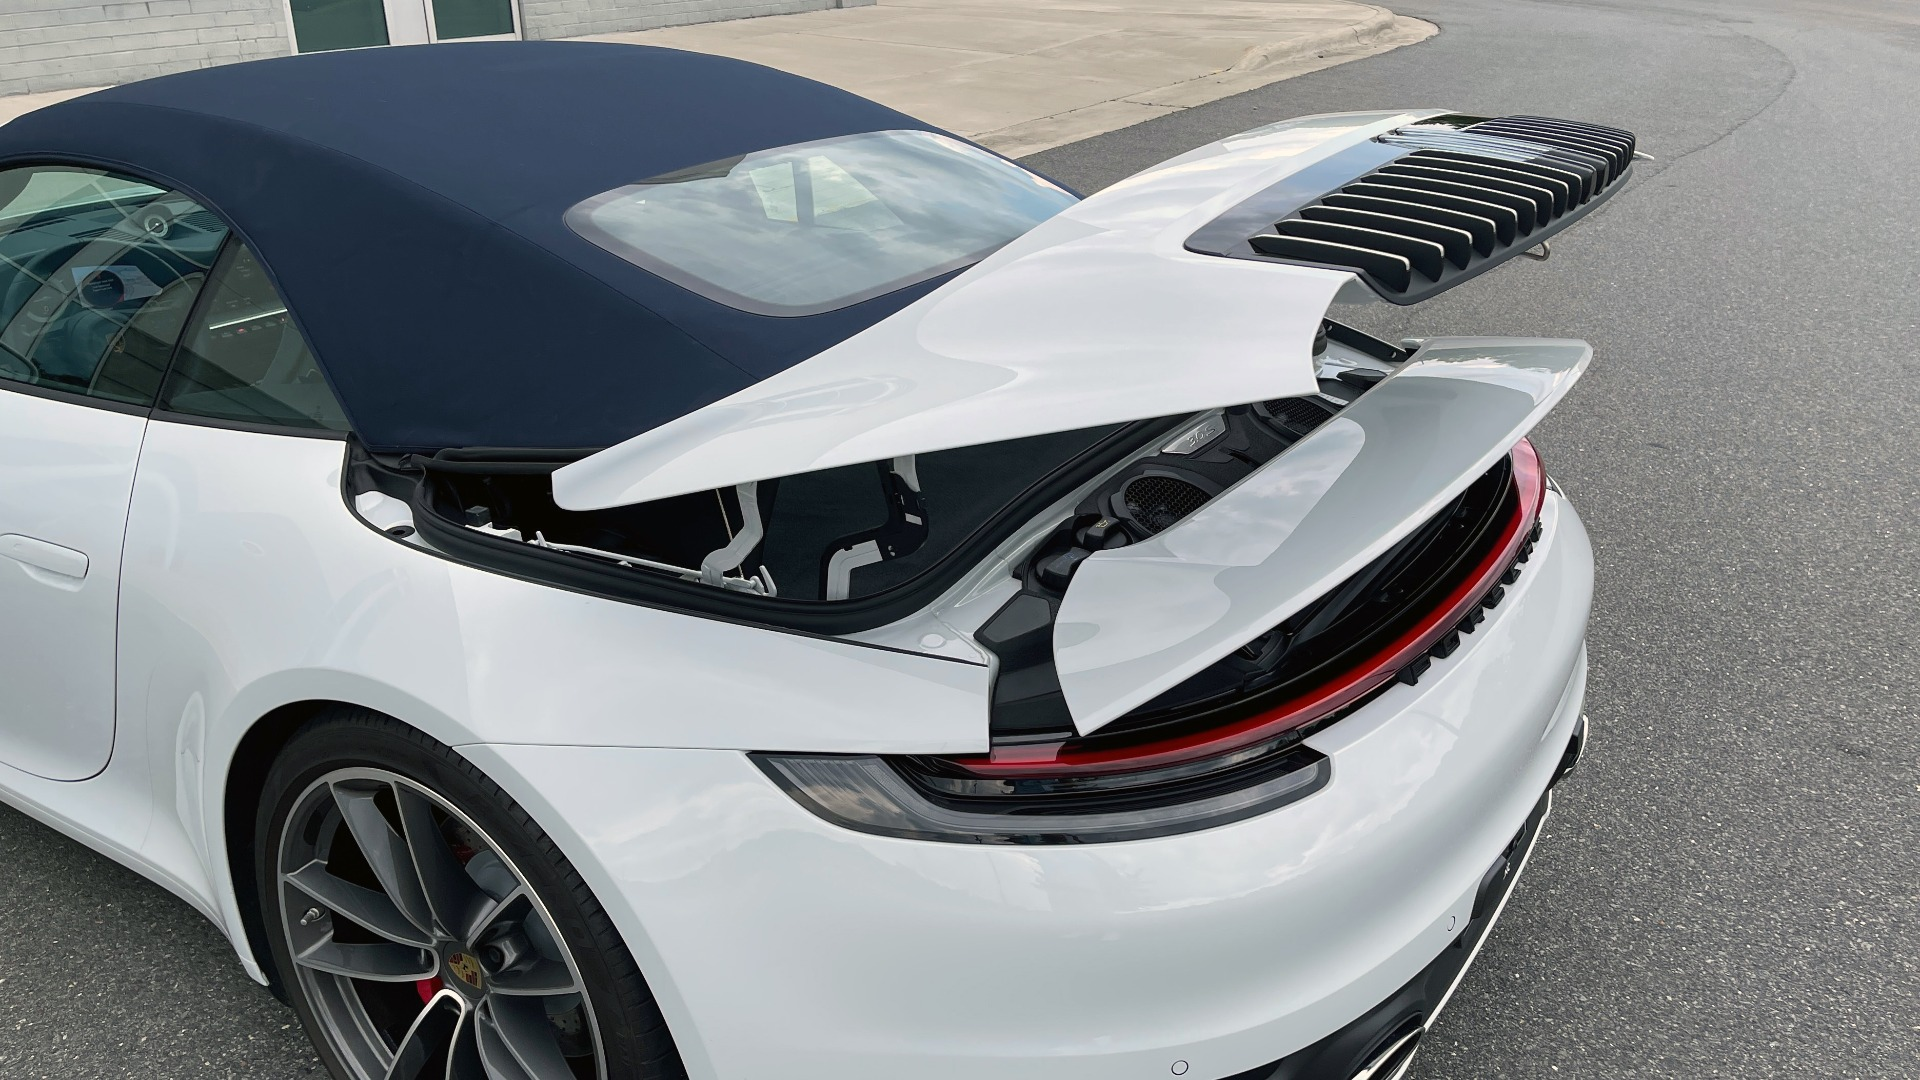 Used 2020 Porsche 911 CARRERA 4S CABRIOLET PREMIUM SPORT PKG / NAV / BOSE / LIGHT DESIGN PKG for sale $167,595 at Formula Imports in Charlotte NC 28227 31